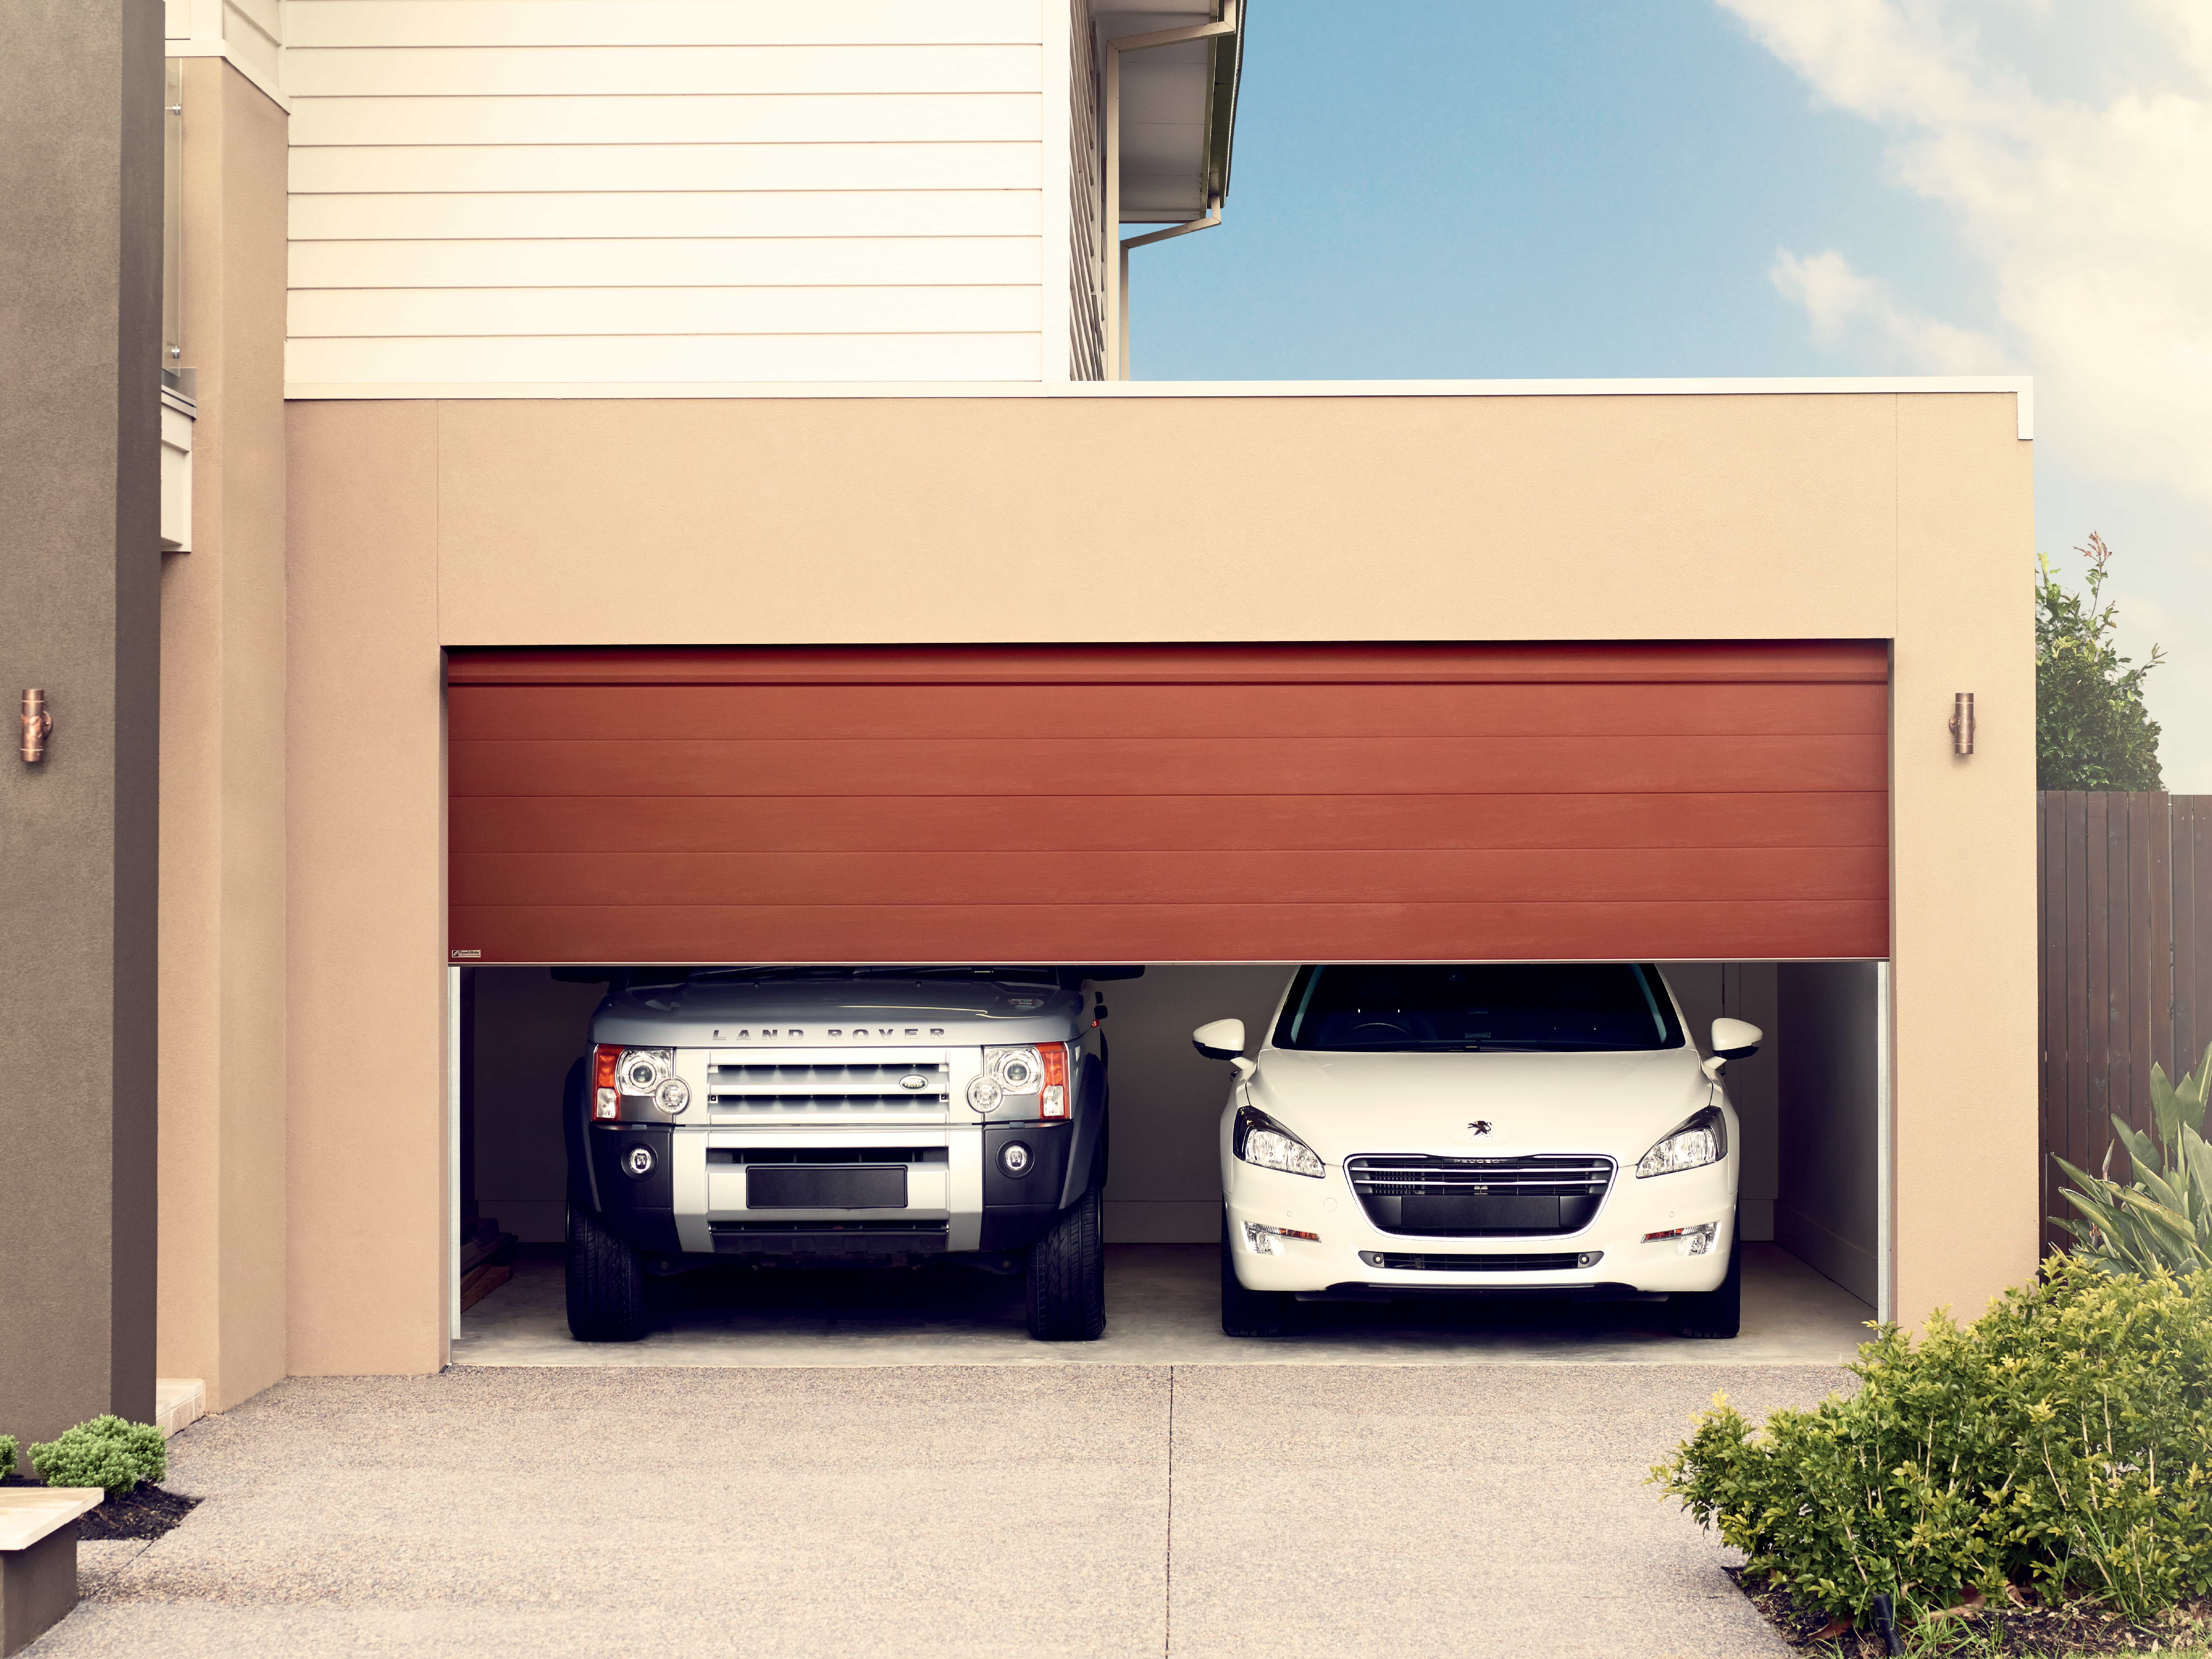 wood vog standard standardplus information chocolatewalnut chocolate steel doors garage faq metal or garaga residential walnut